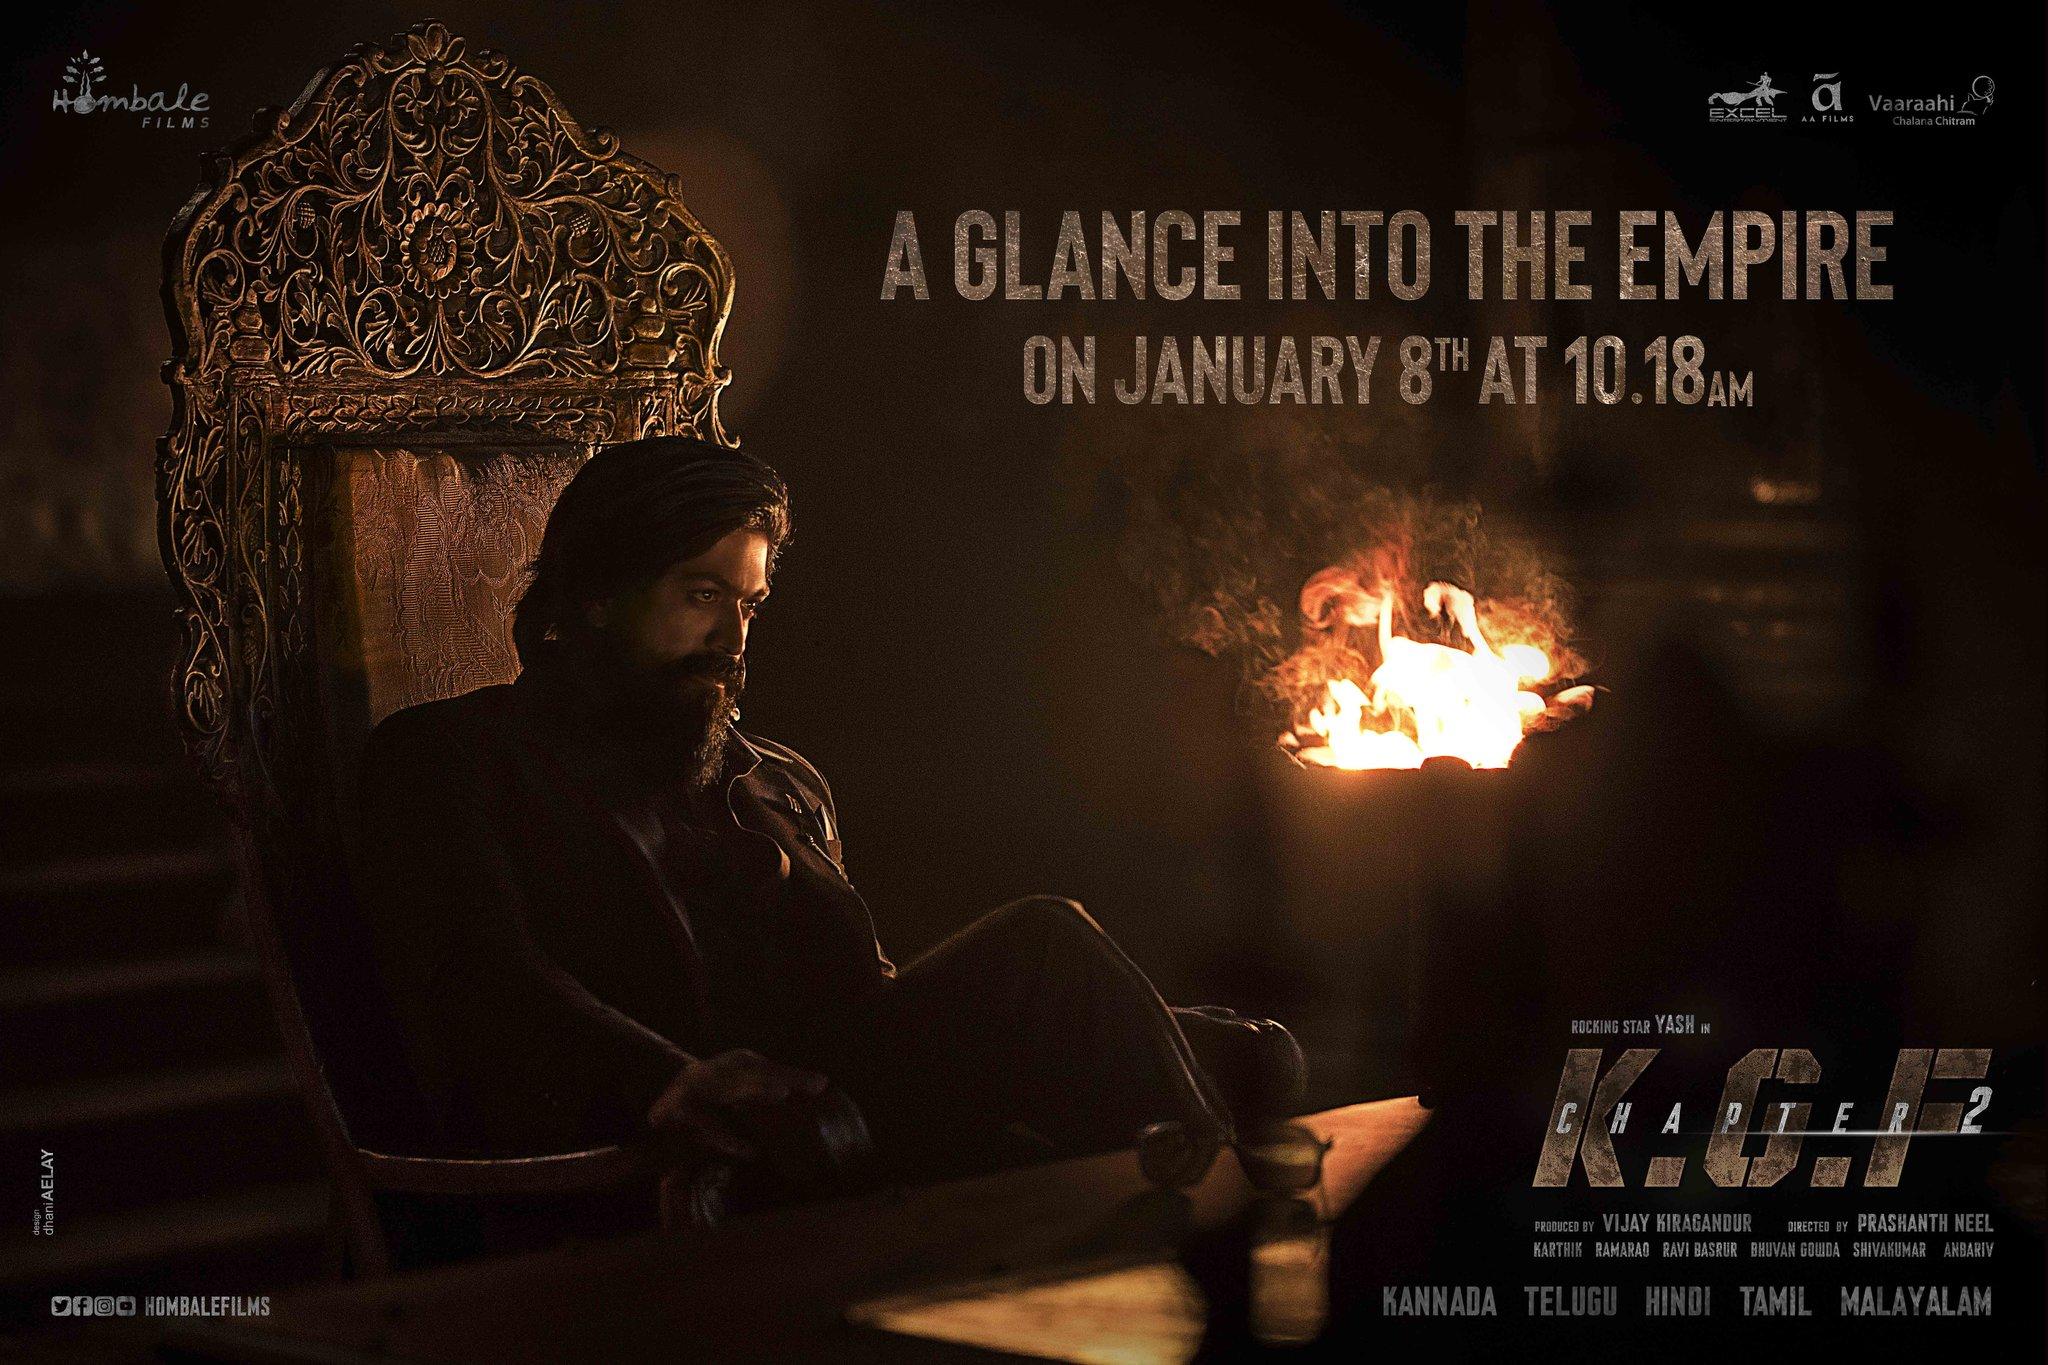 KGF Chapter 2 Teaser On Jan 8th